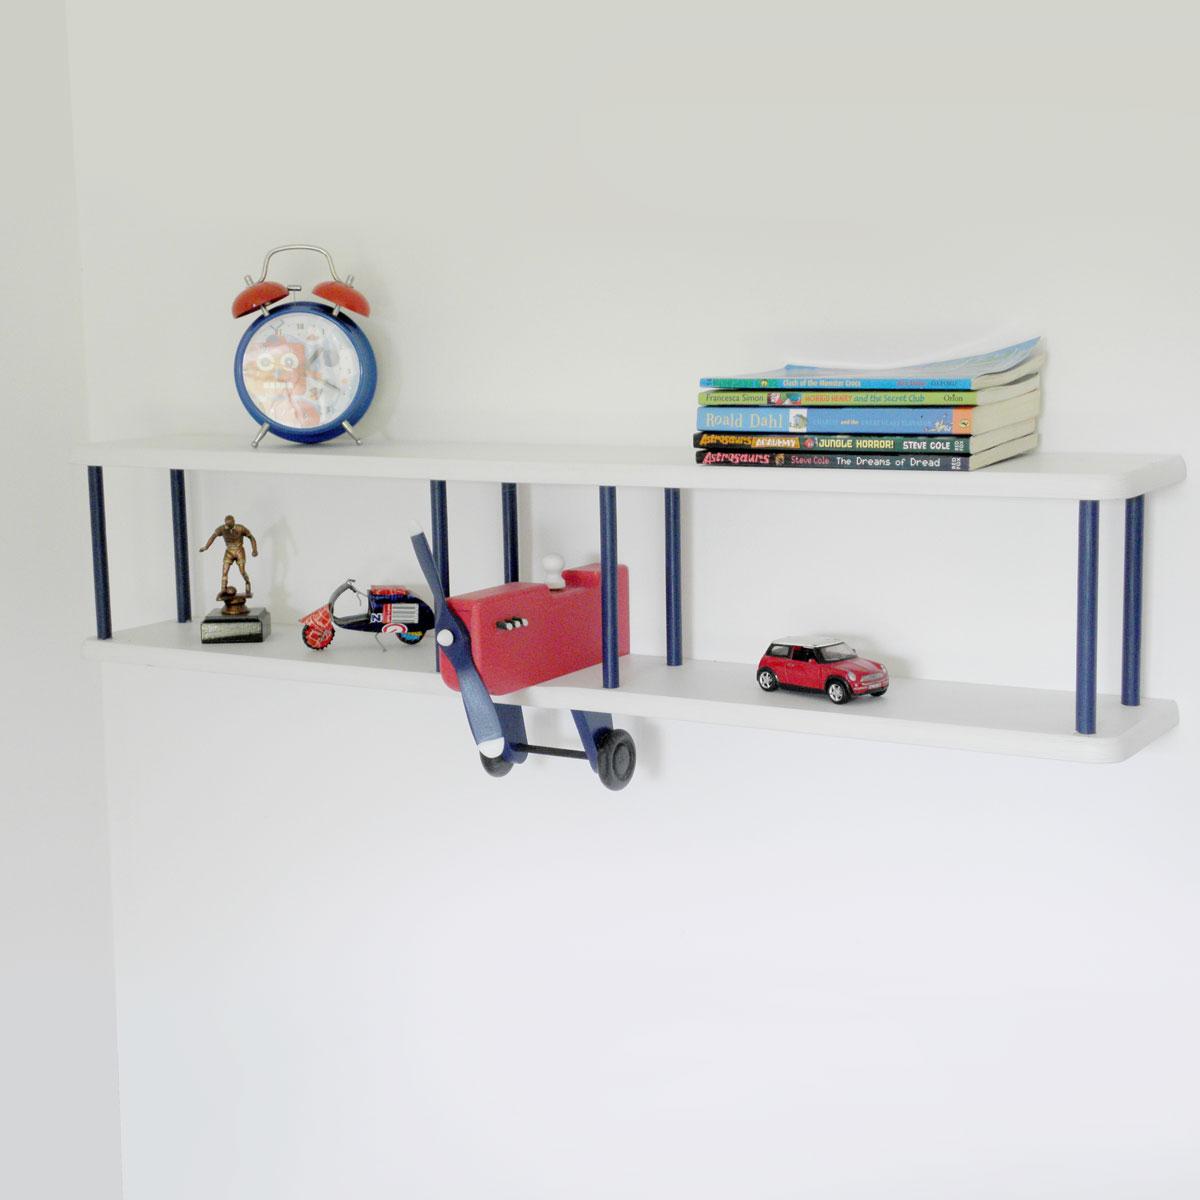 Bi-Plane Wall Shelf - Navy/Red/White